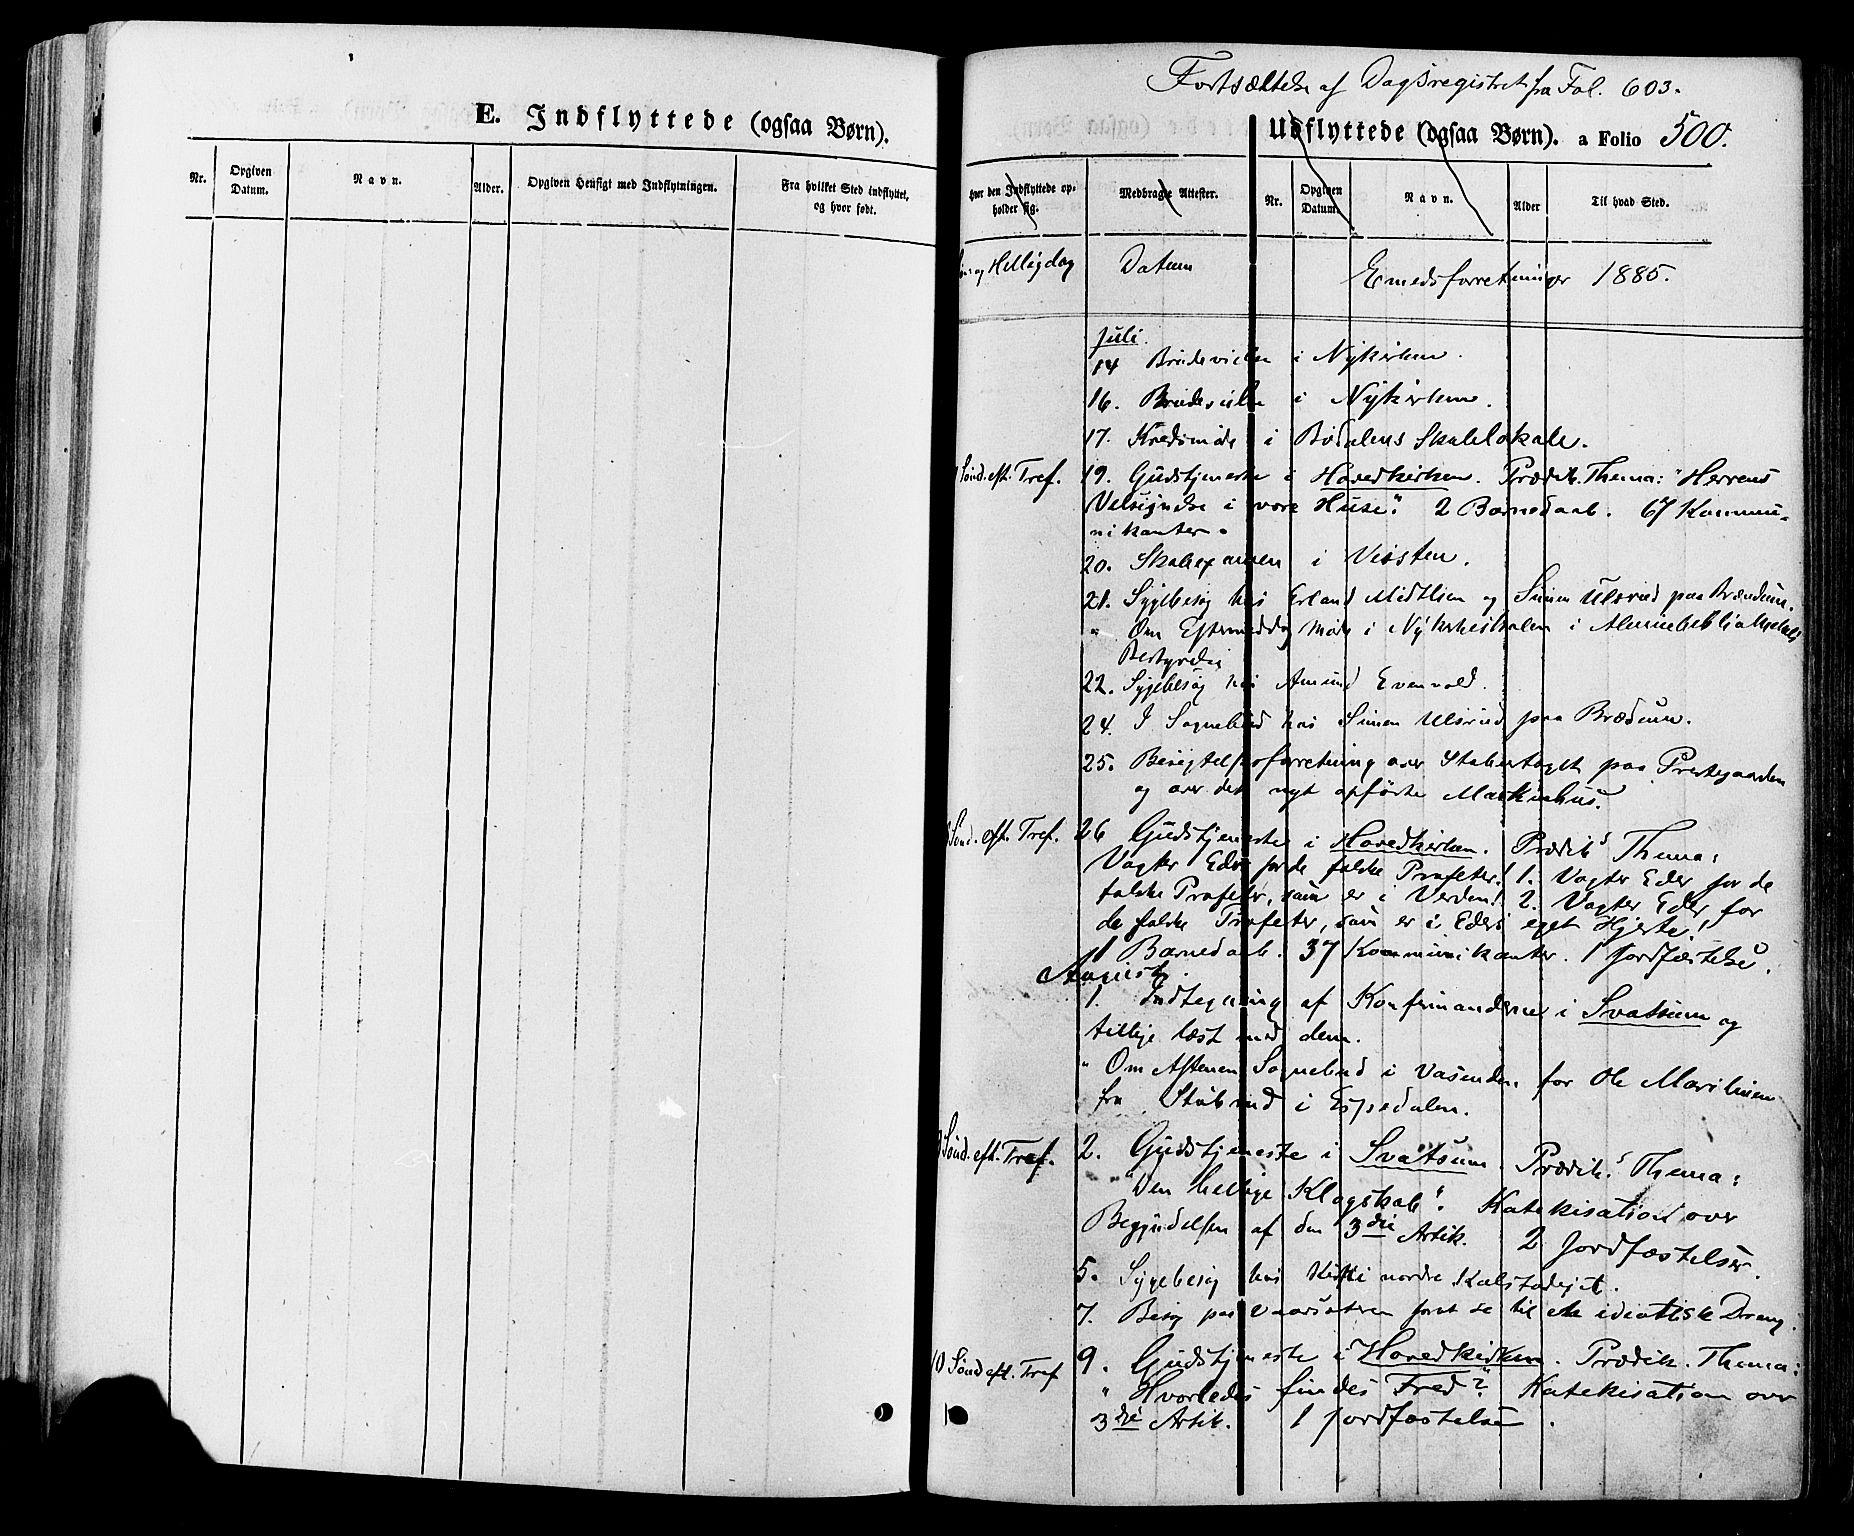 SAH, Gausdal prestekontor, Ministerialbok nr. 10, 1867-1886, s. 500